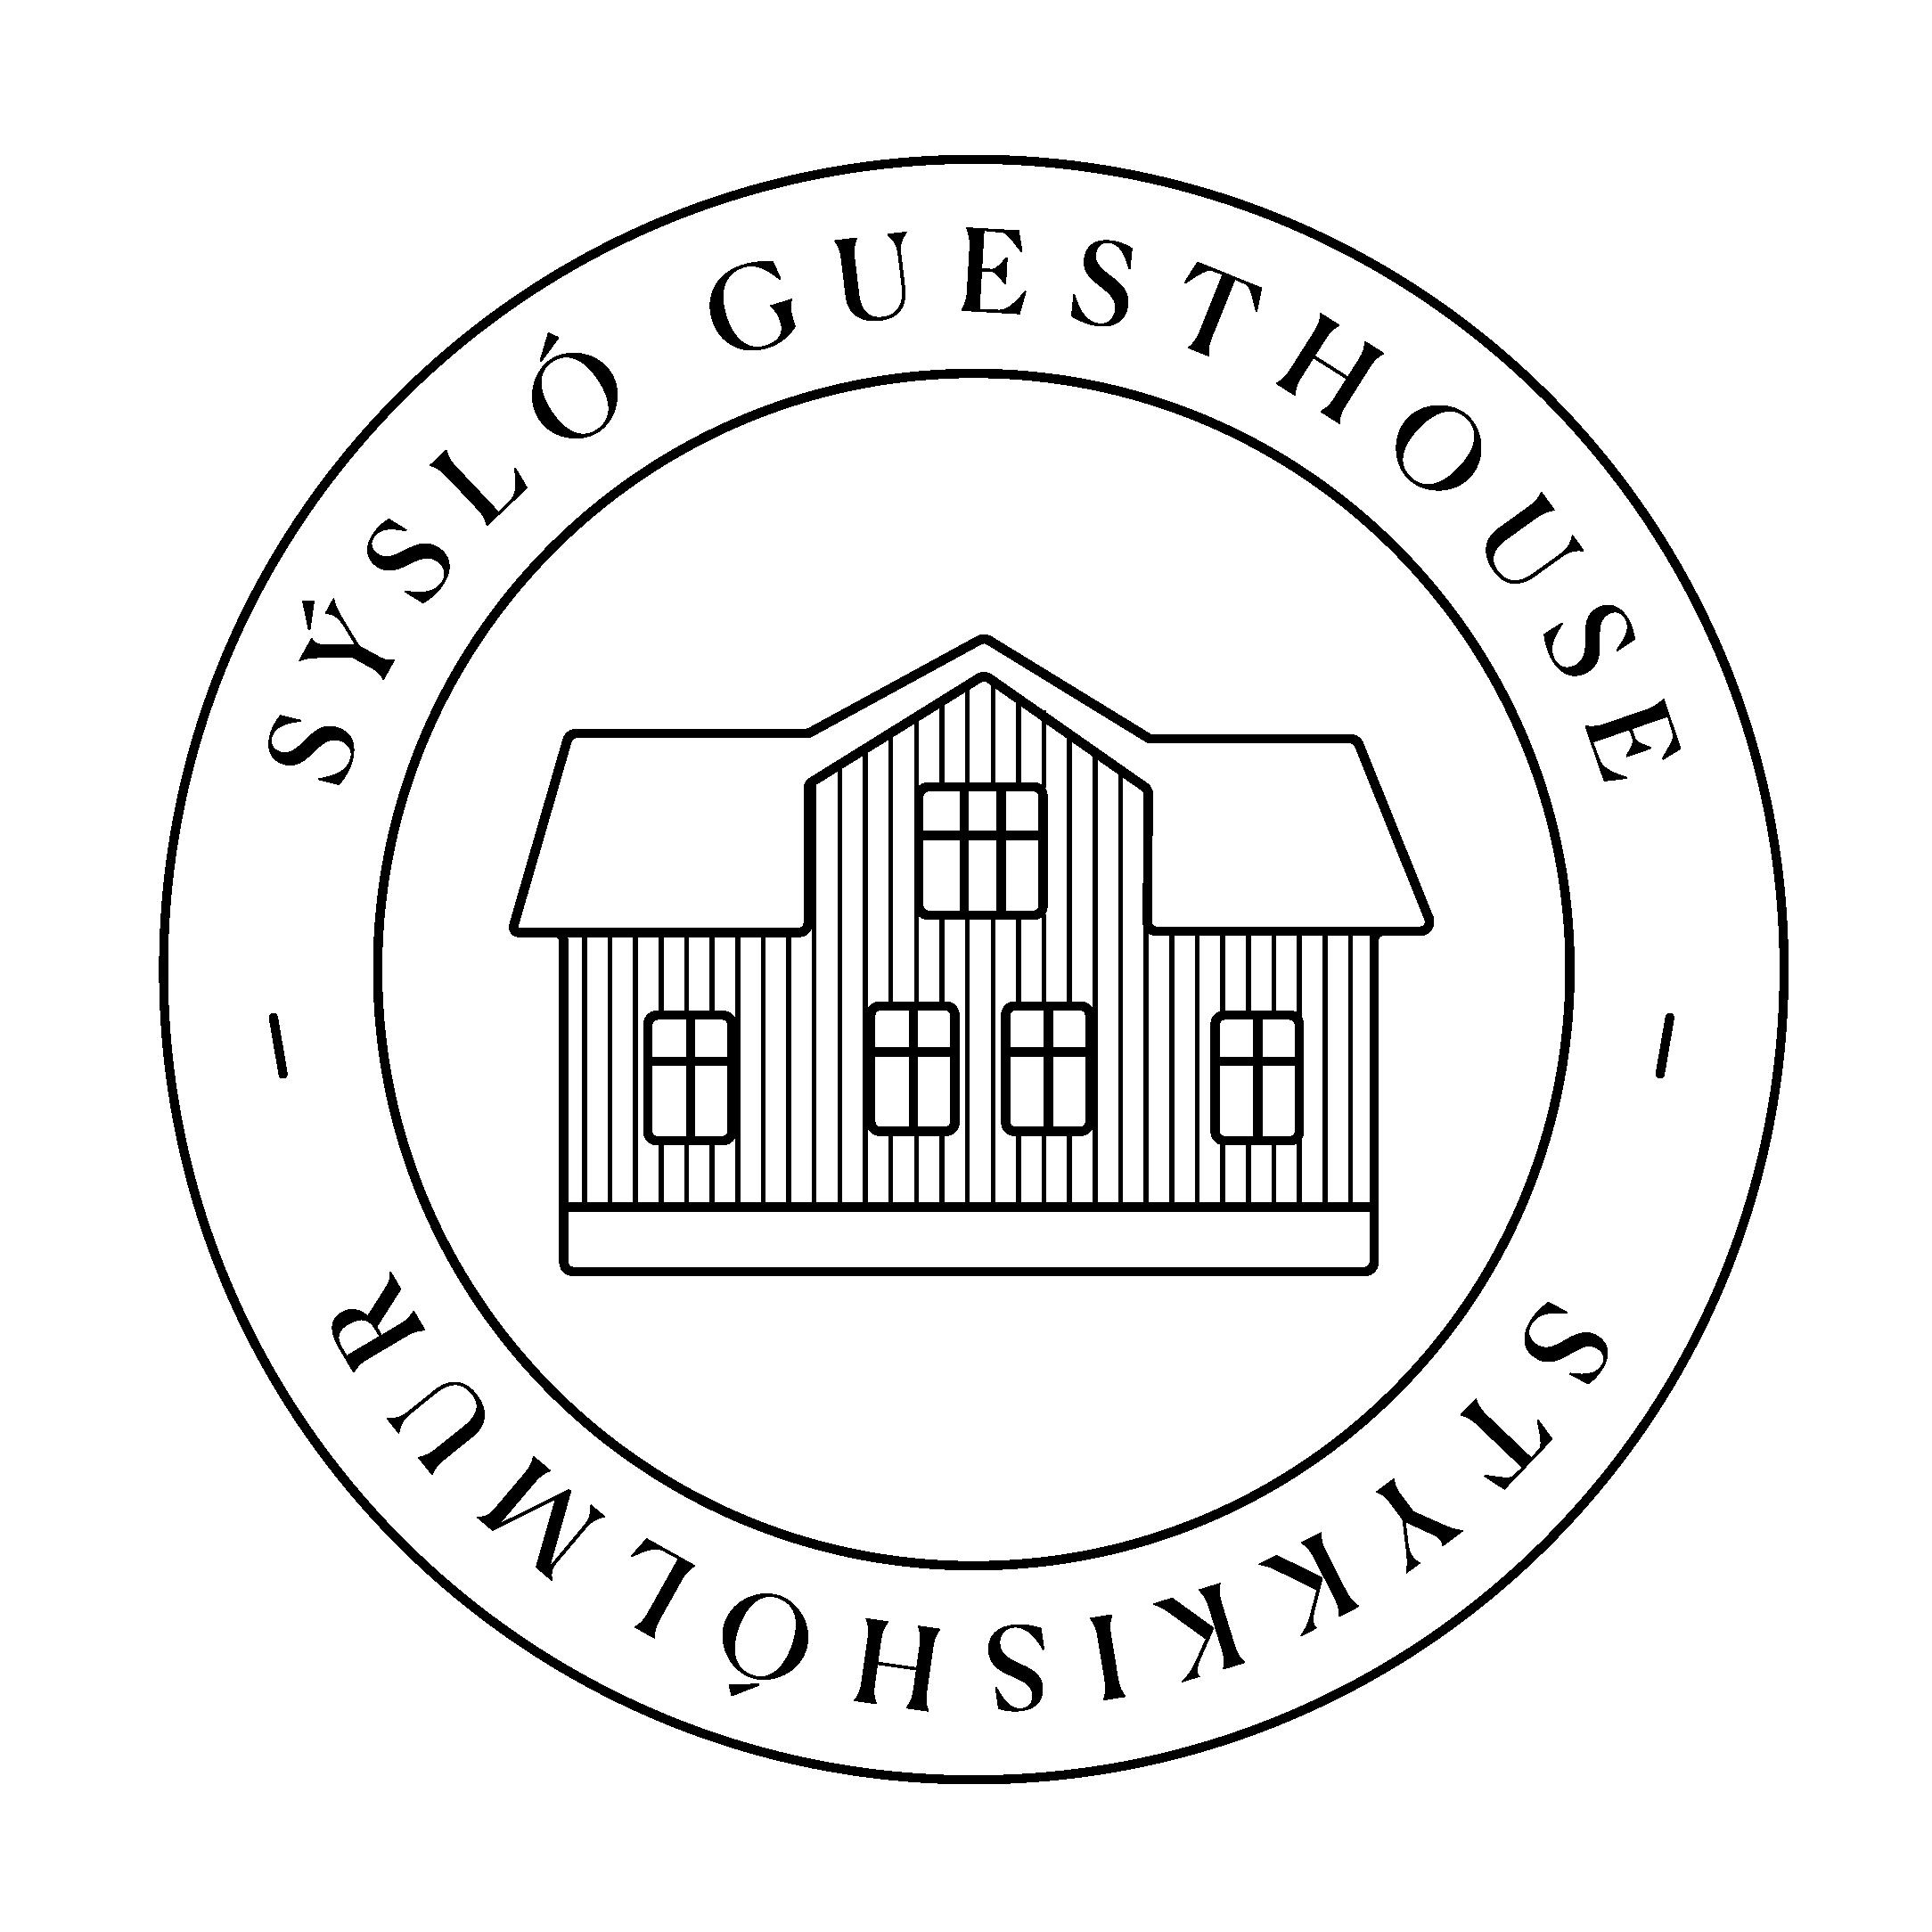 syslo_logo_emblem.png